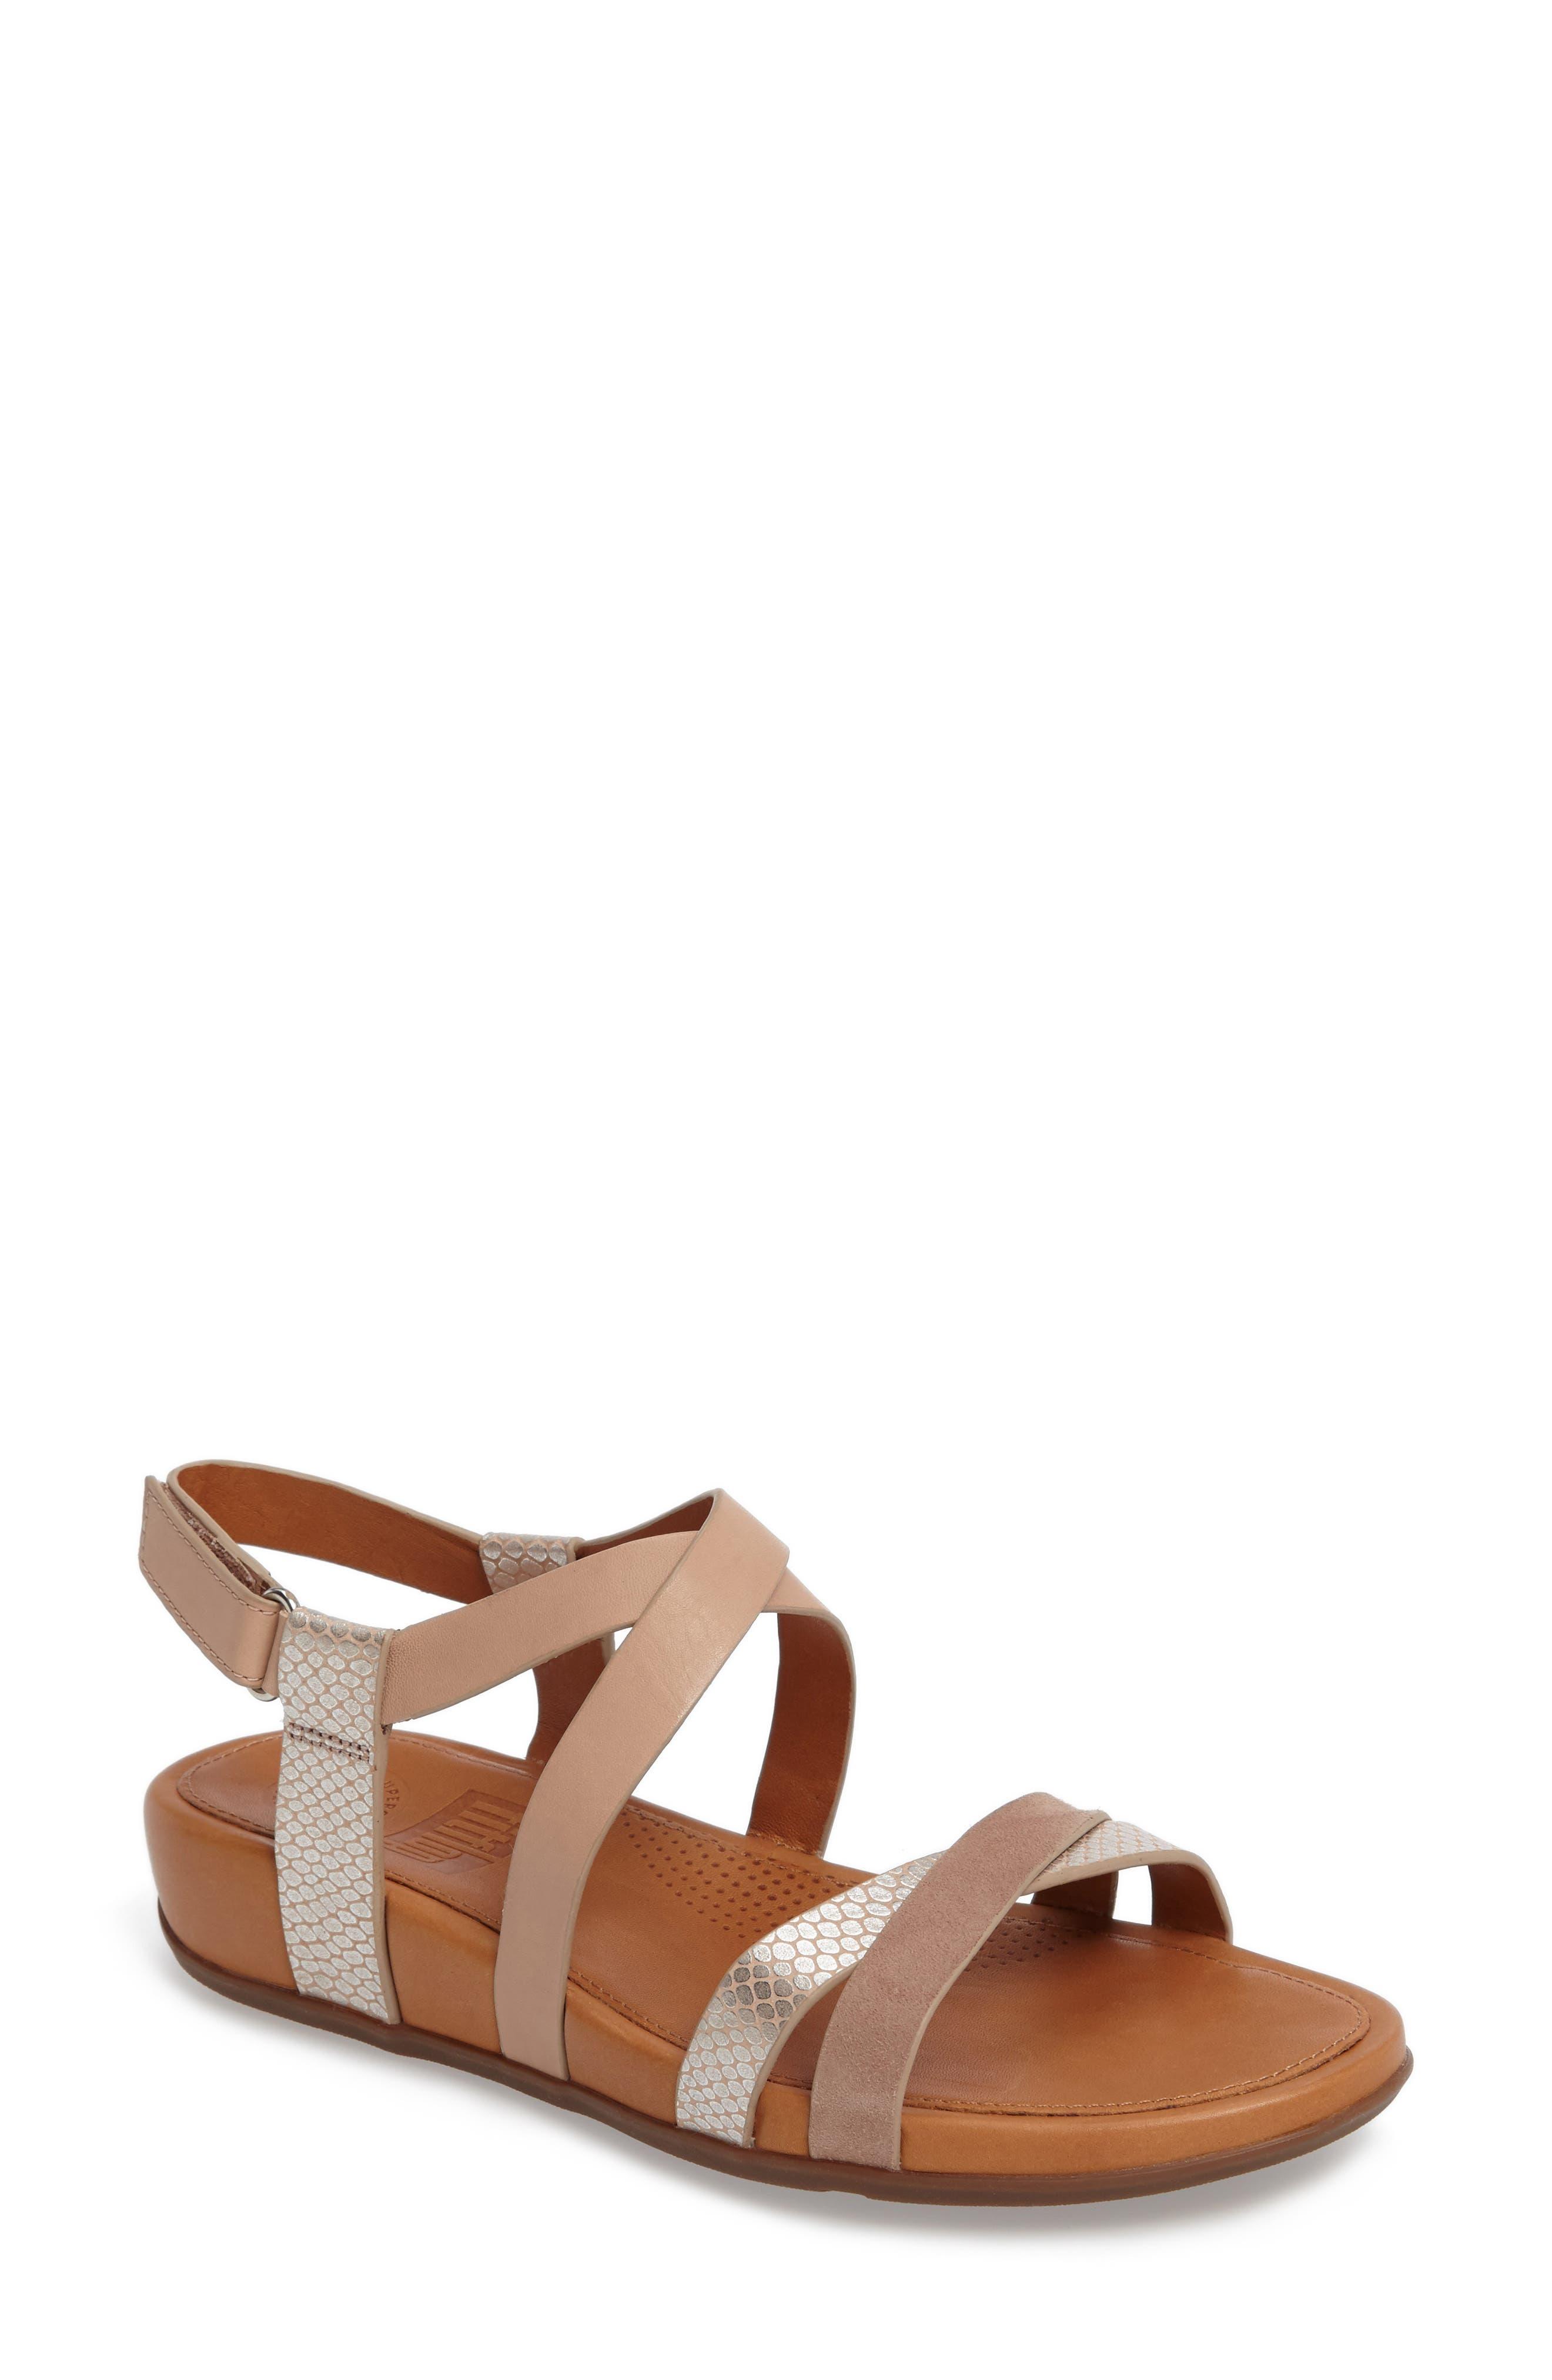 Lumy Crisscross Sandal,                             Main thumbnail 1, color,                             290